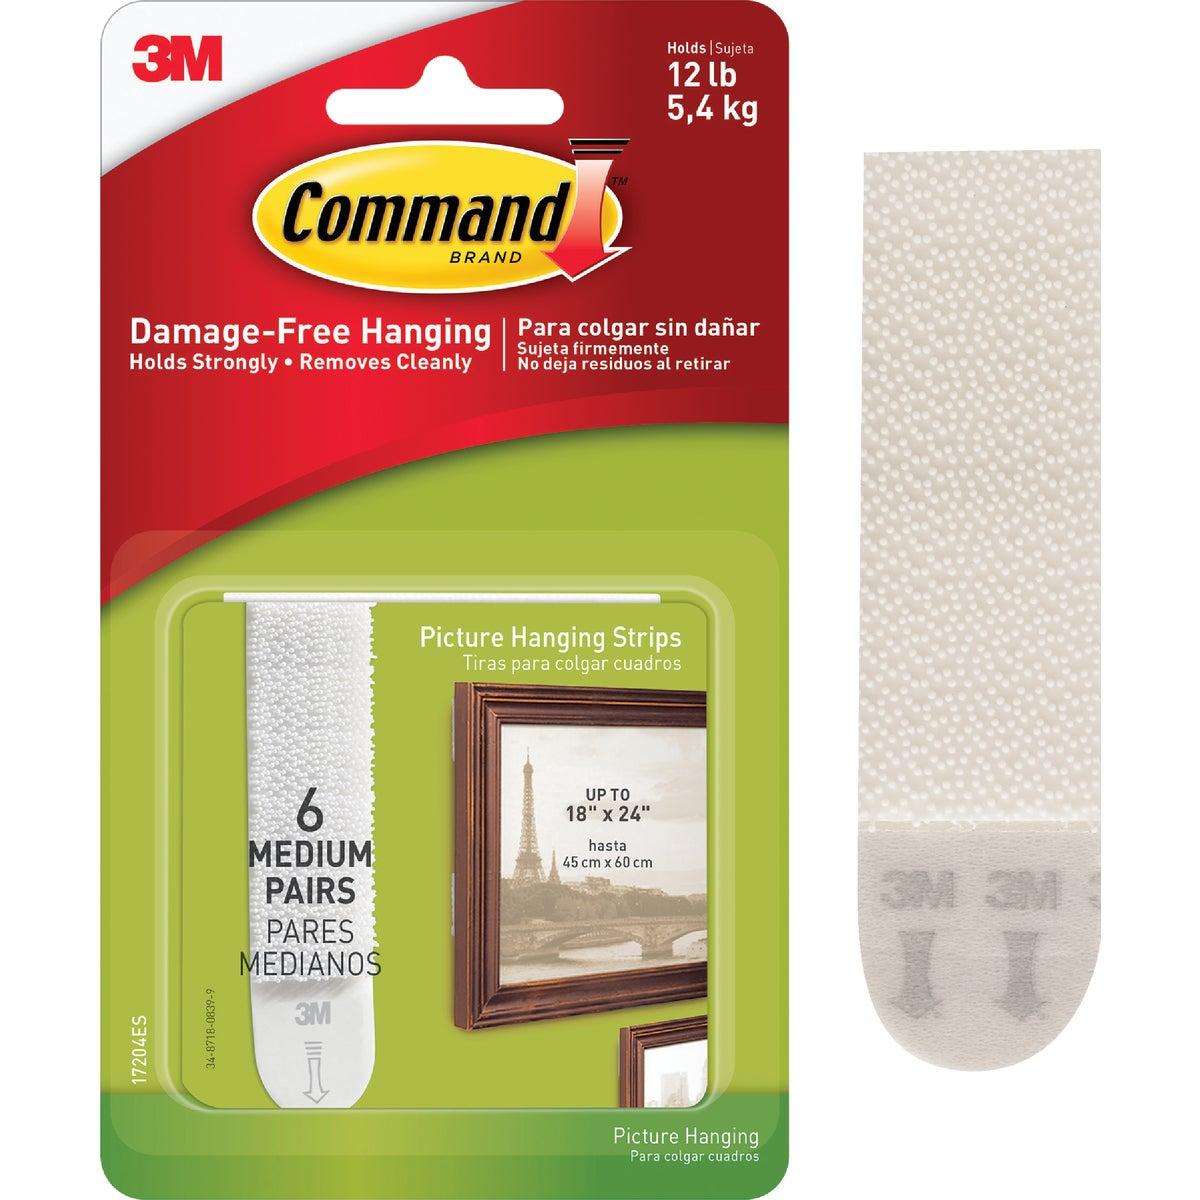 CMD MED INTRLK FASTENER - 17204 by 3m Co